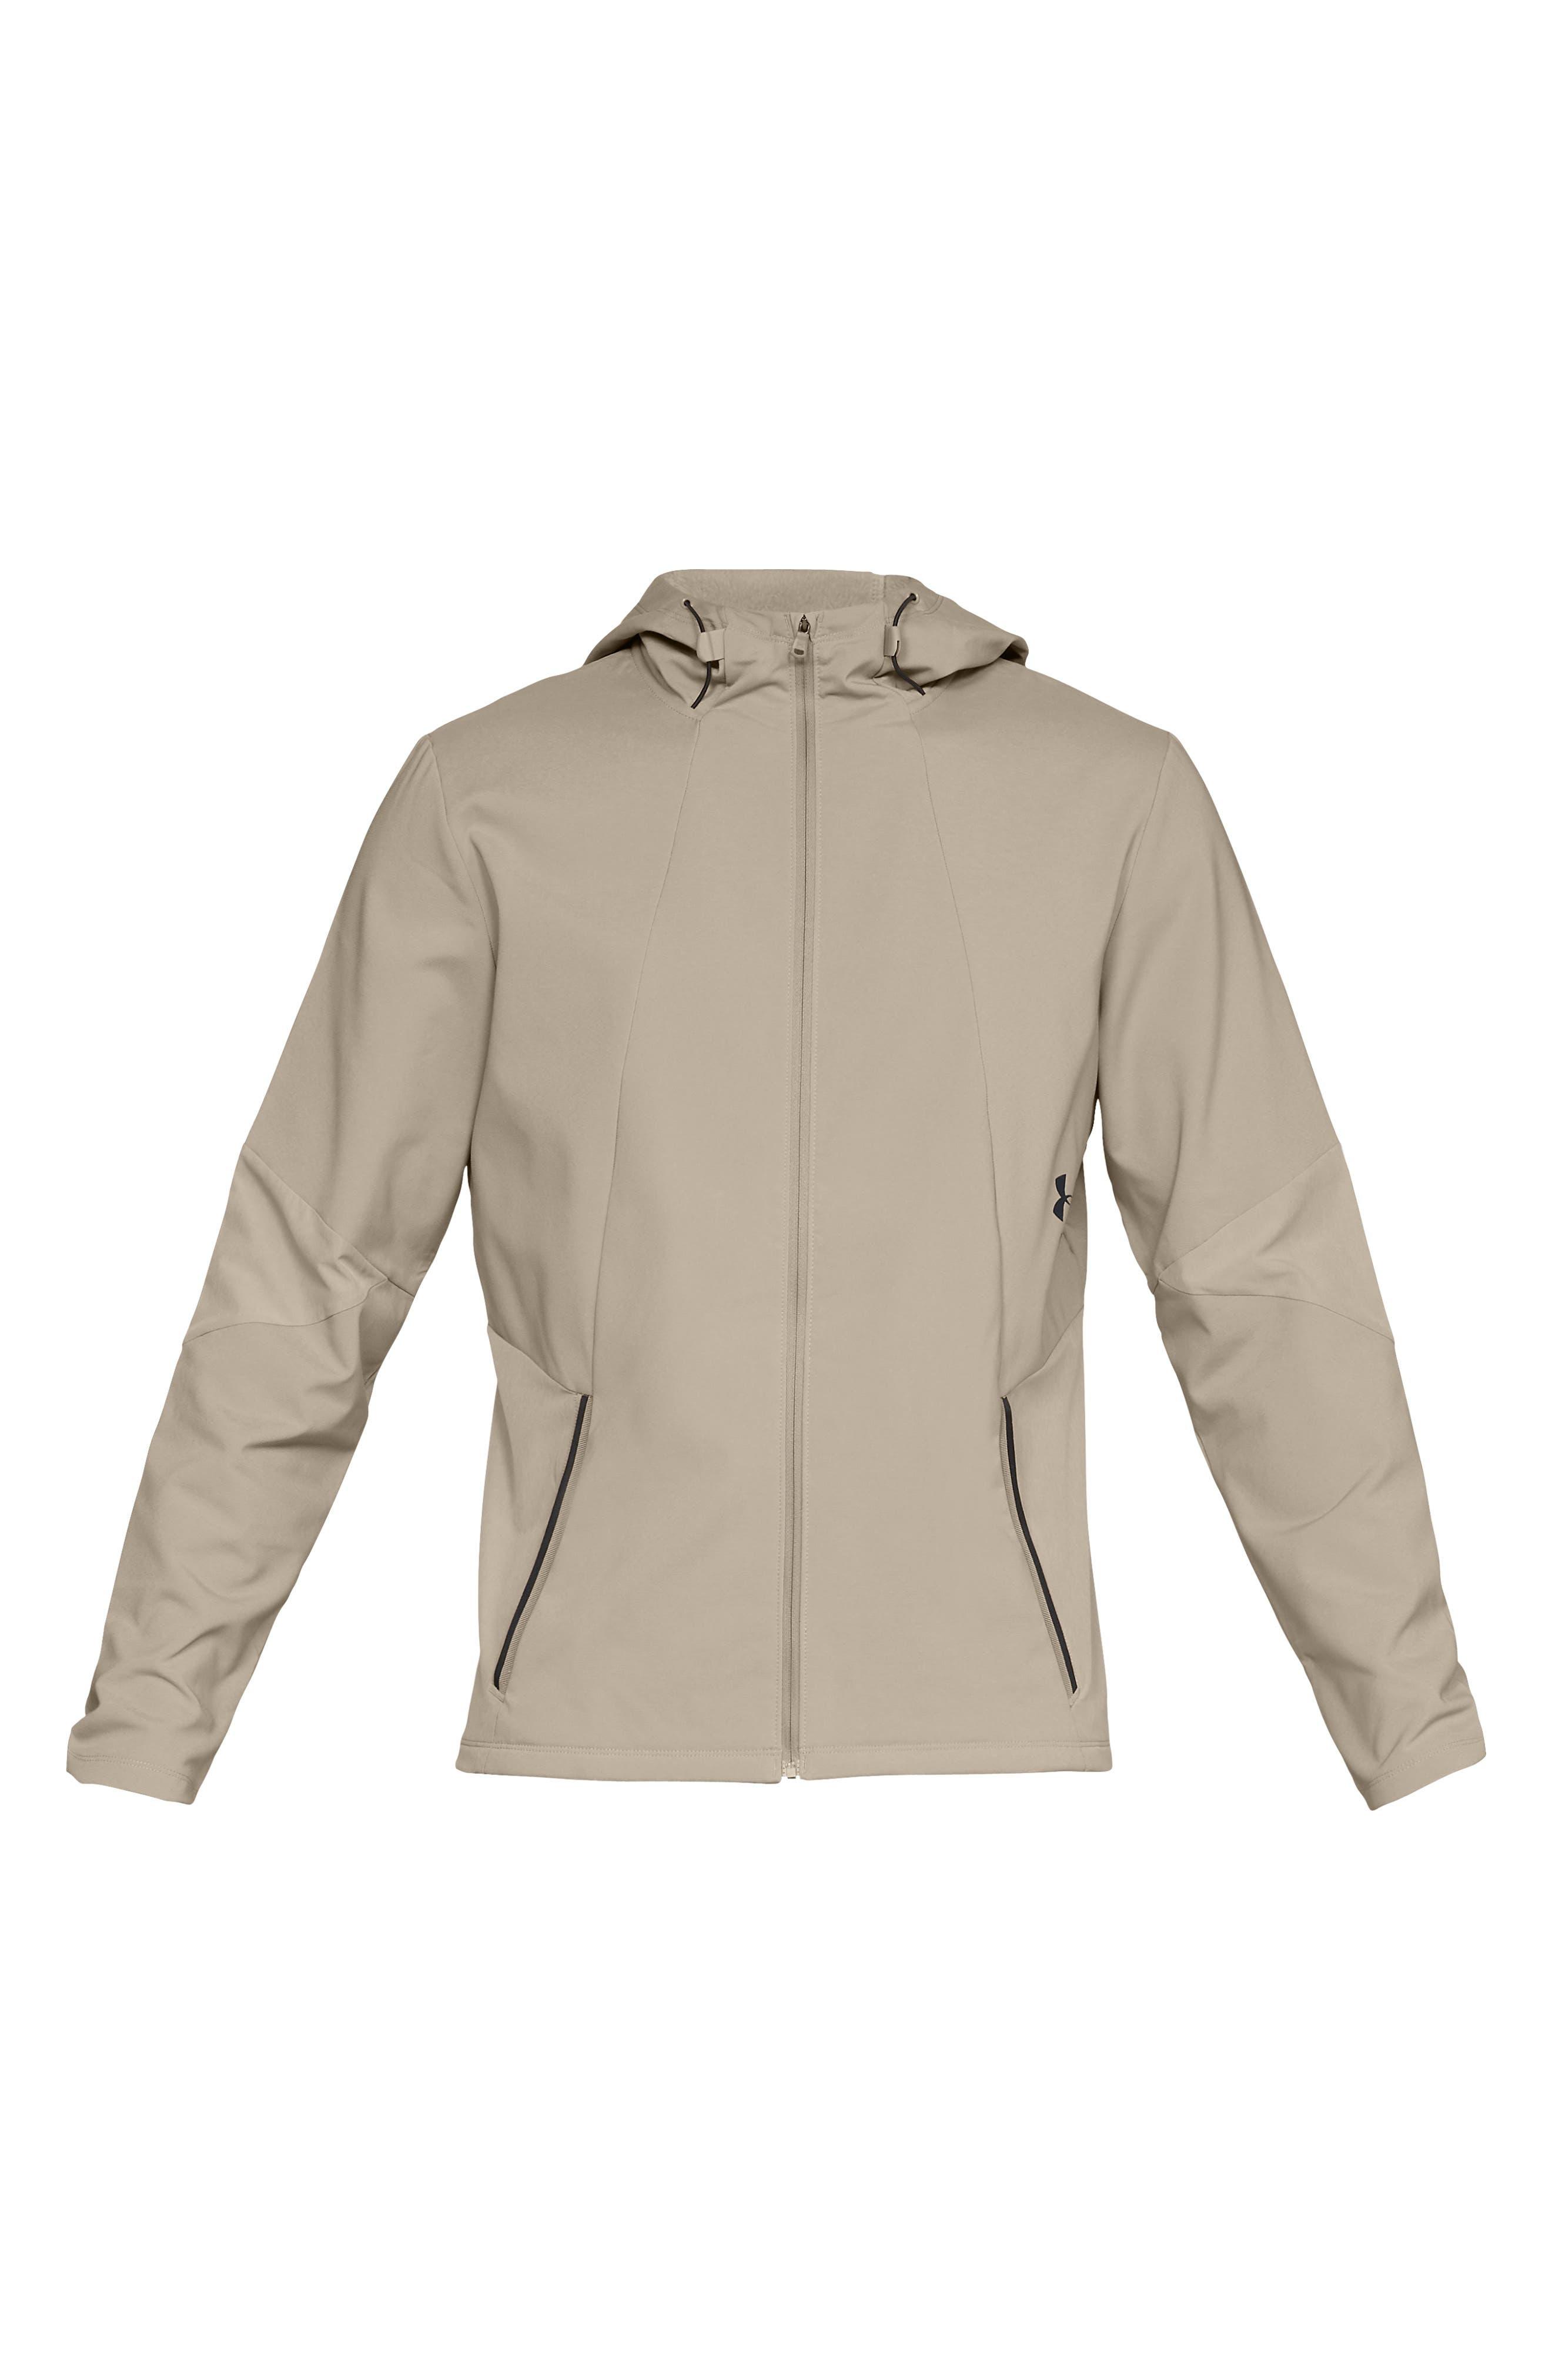 Storm Cyclone Water Repellent Hooded Jacket,                             Alternate thumbnail 6, color,                             CITY KHAKI/ BLACK